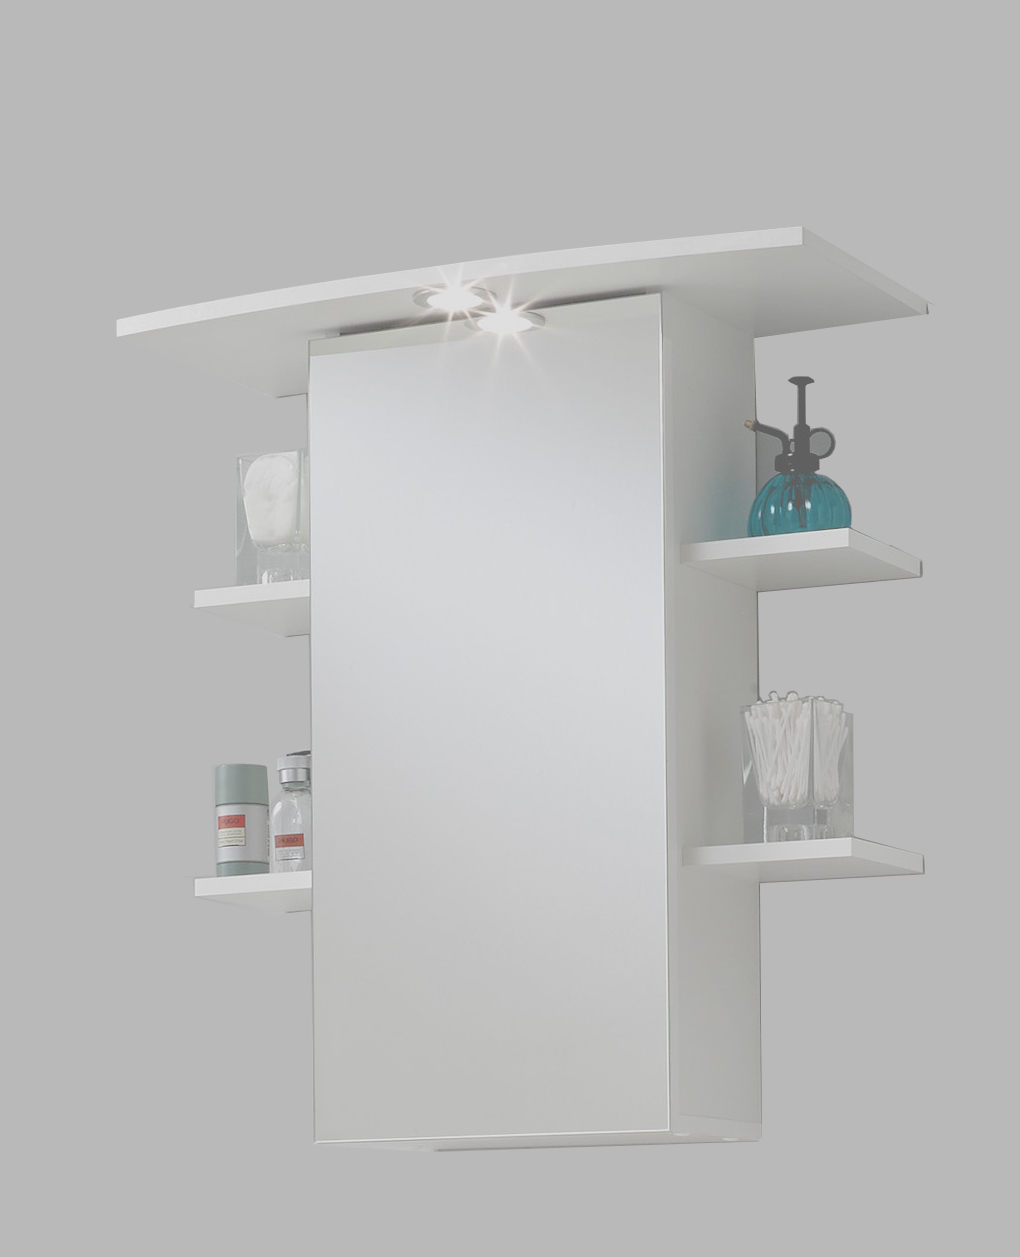 Badkamer spiegelkast Madrid 8 - Wit - Woon Woon